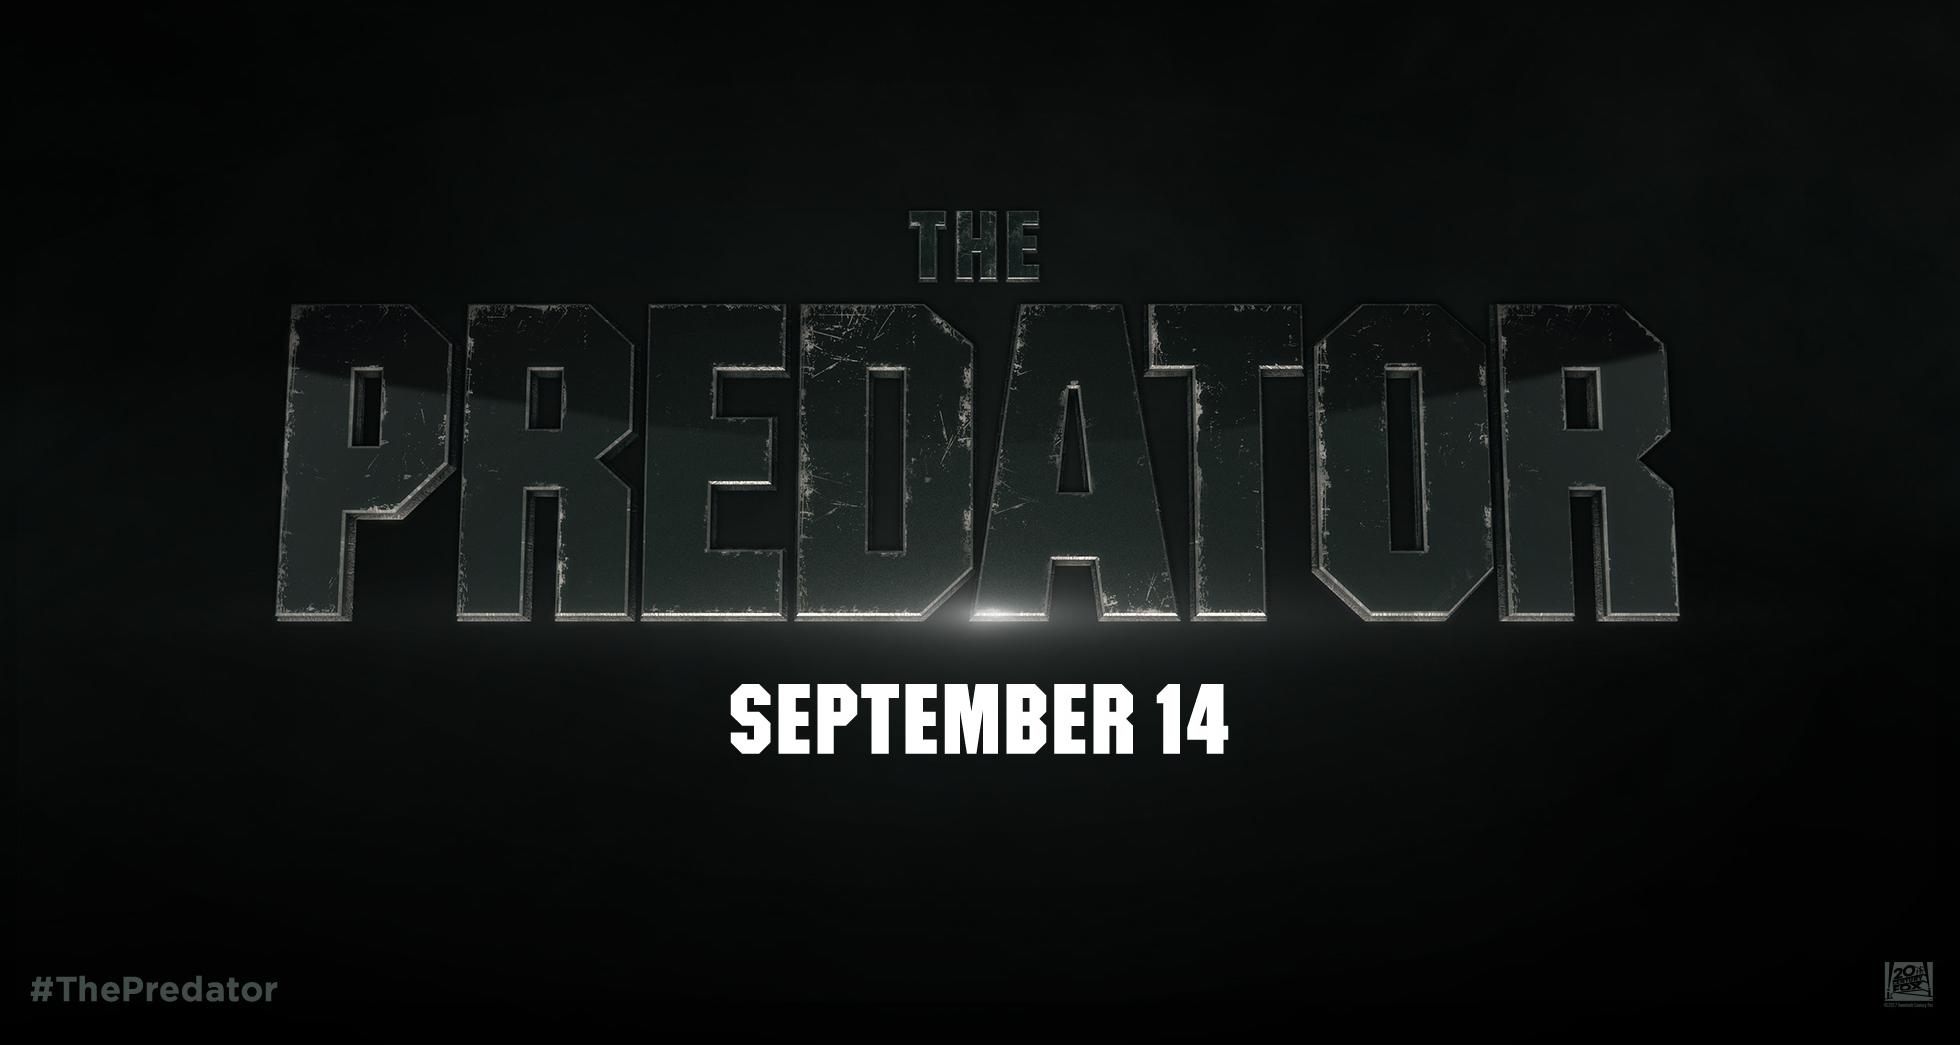 The Predator logo